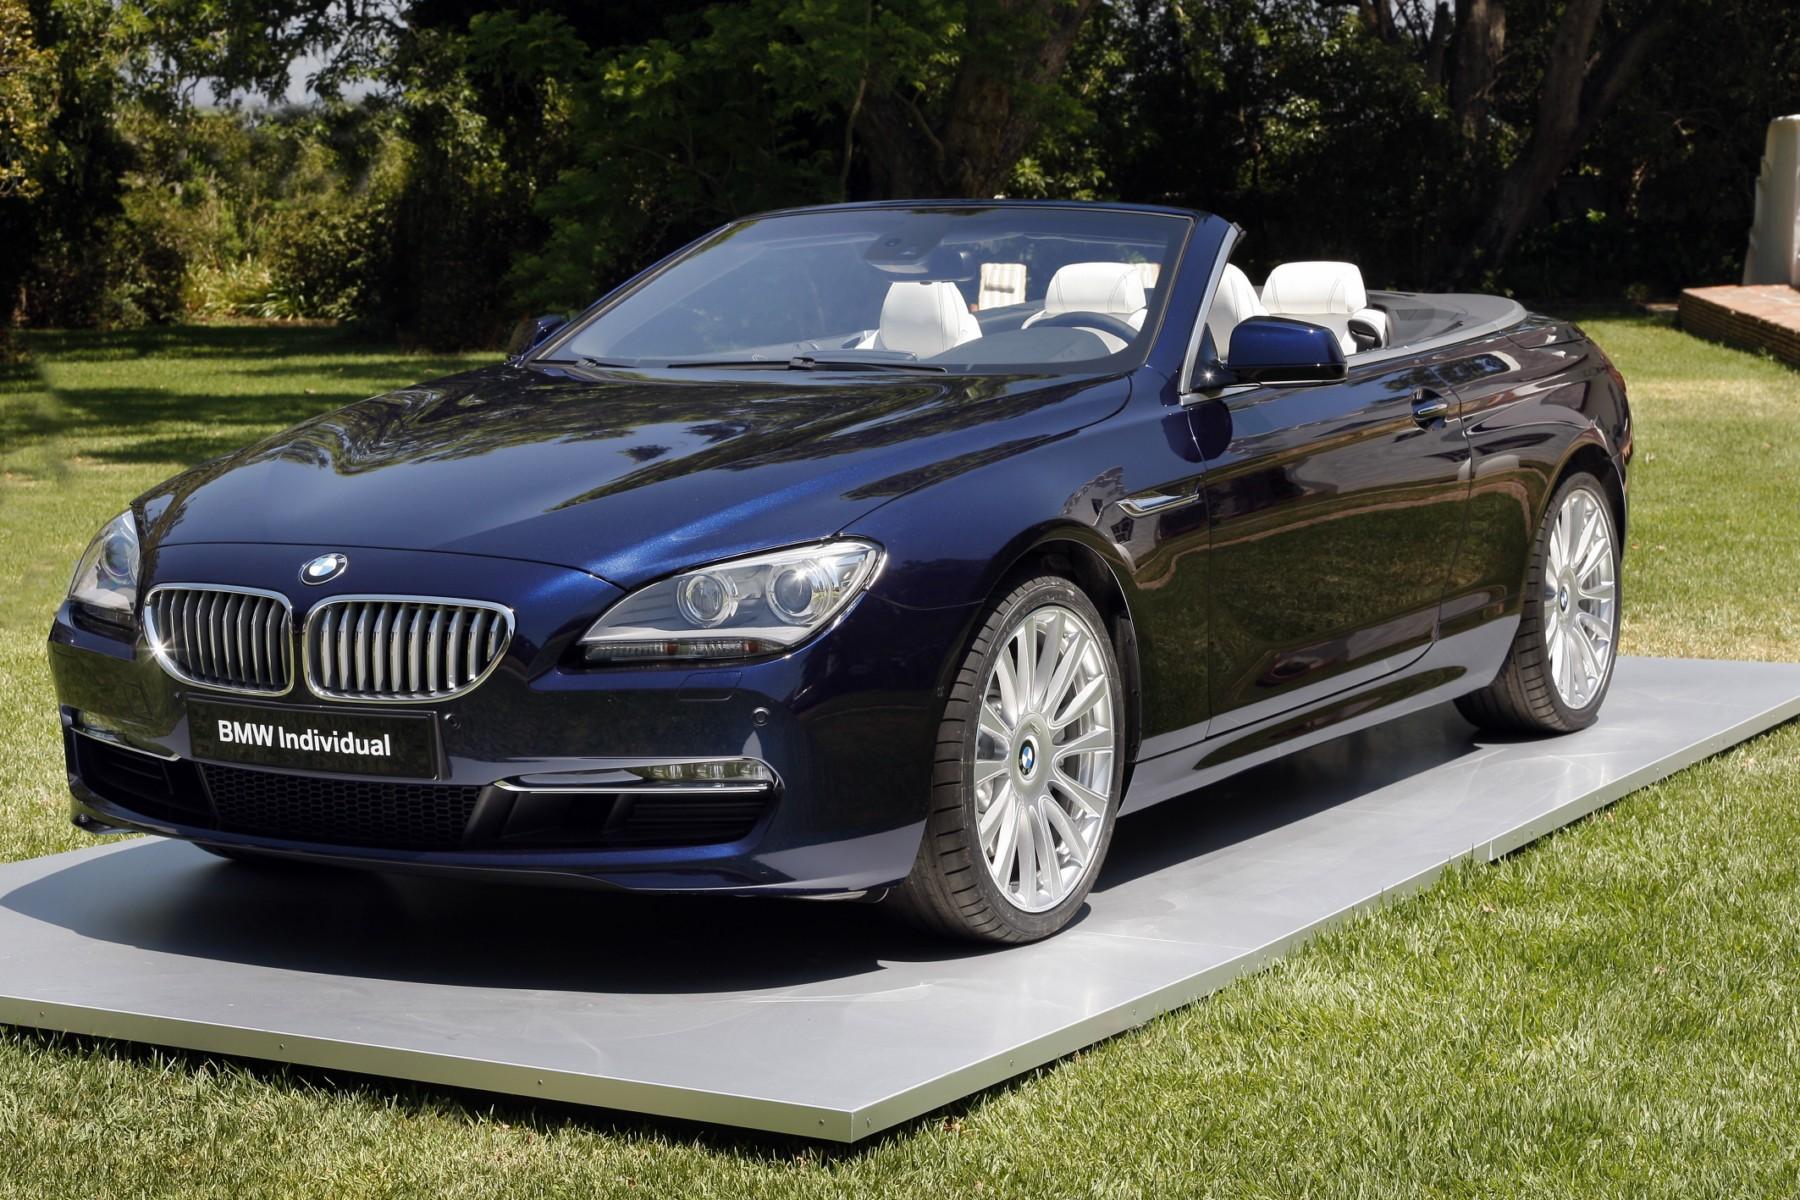 2012 bmw 6 series convertible individual. Black Bedroom Furniture Sets. Home Design Ideas